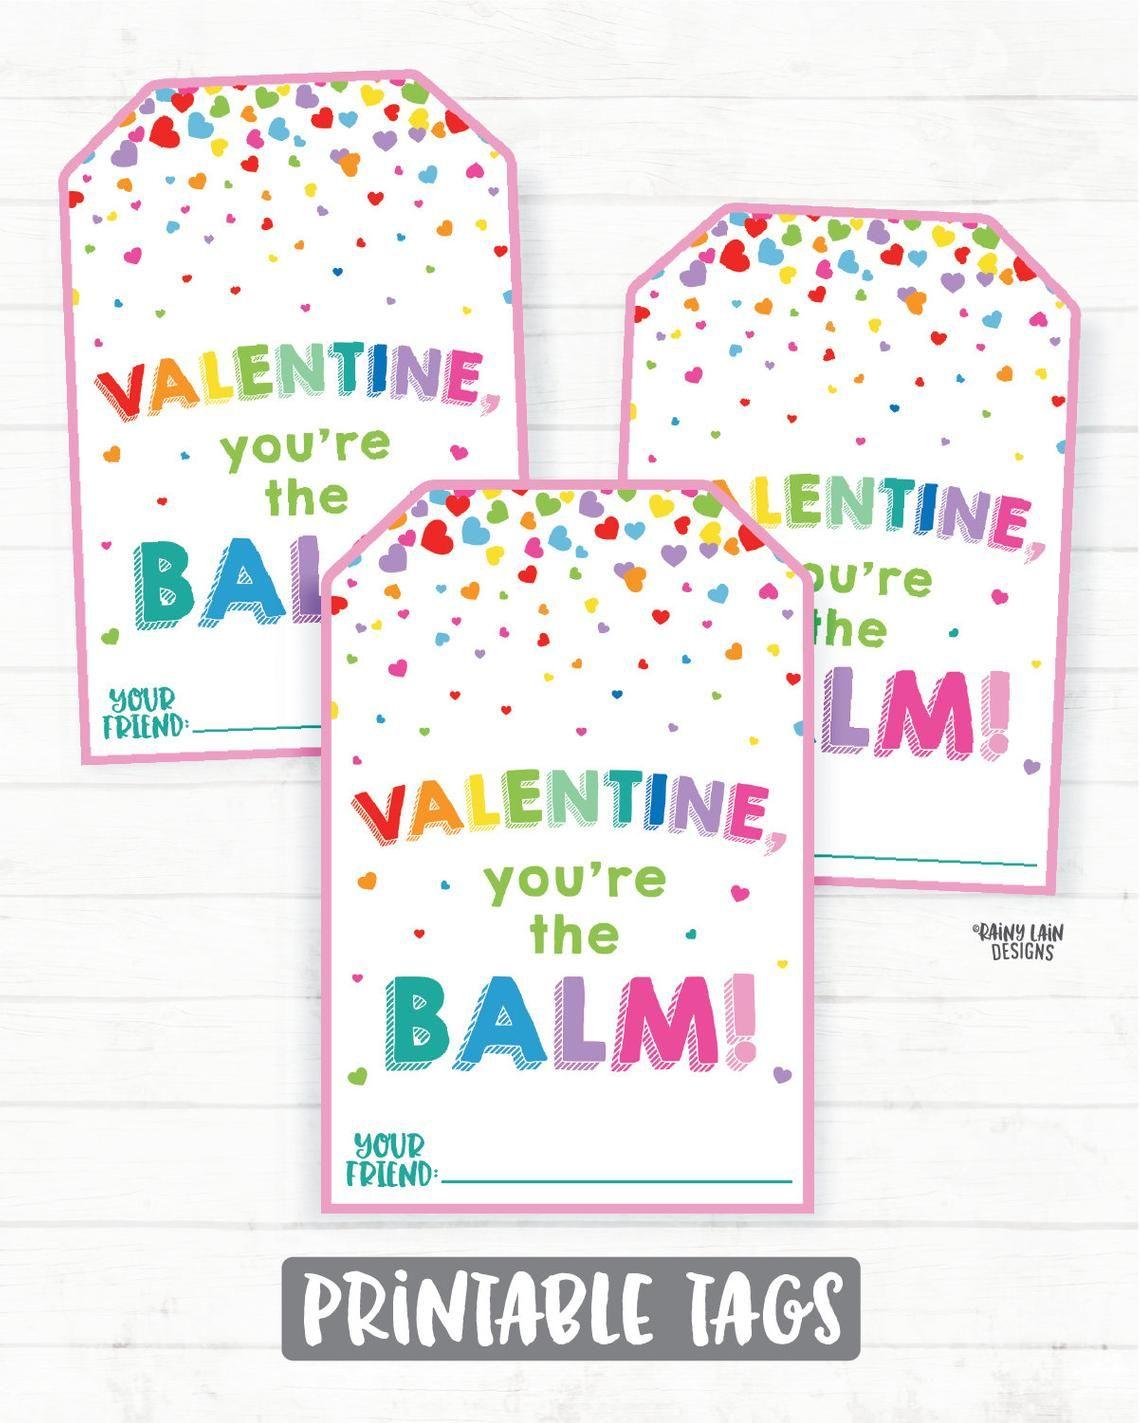 You're the Balm Valentine, Lip Balm Valentine Tag ...